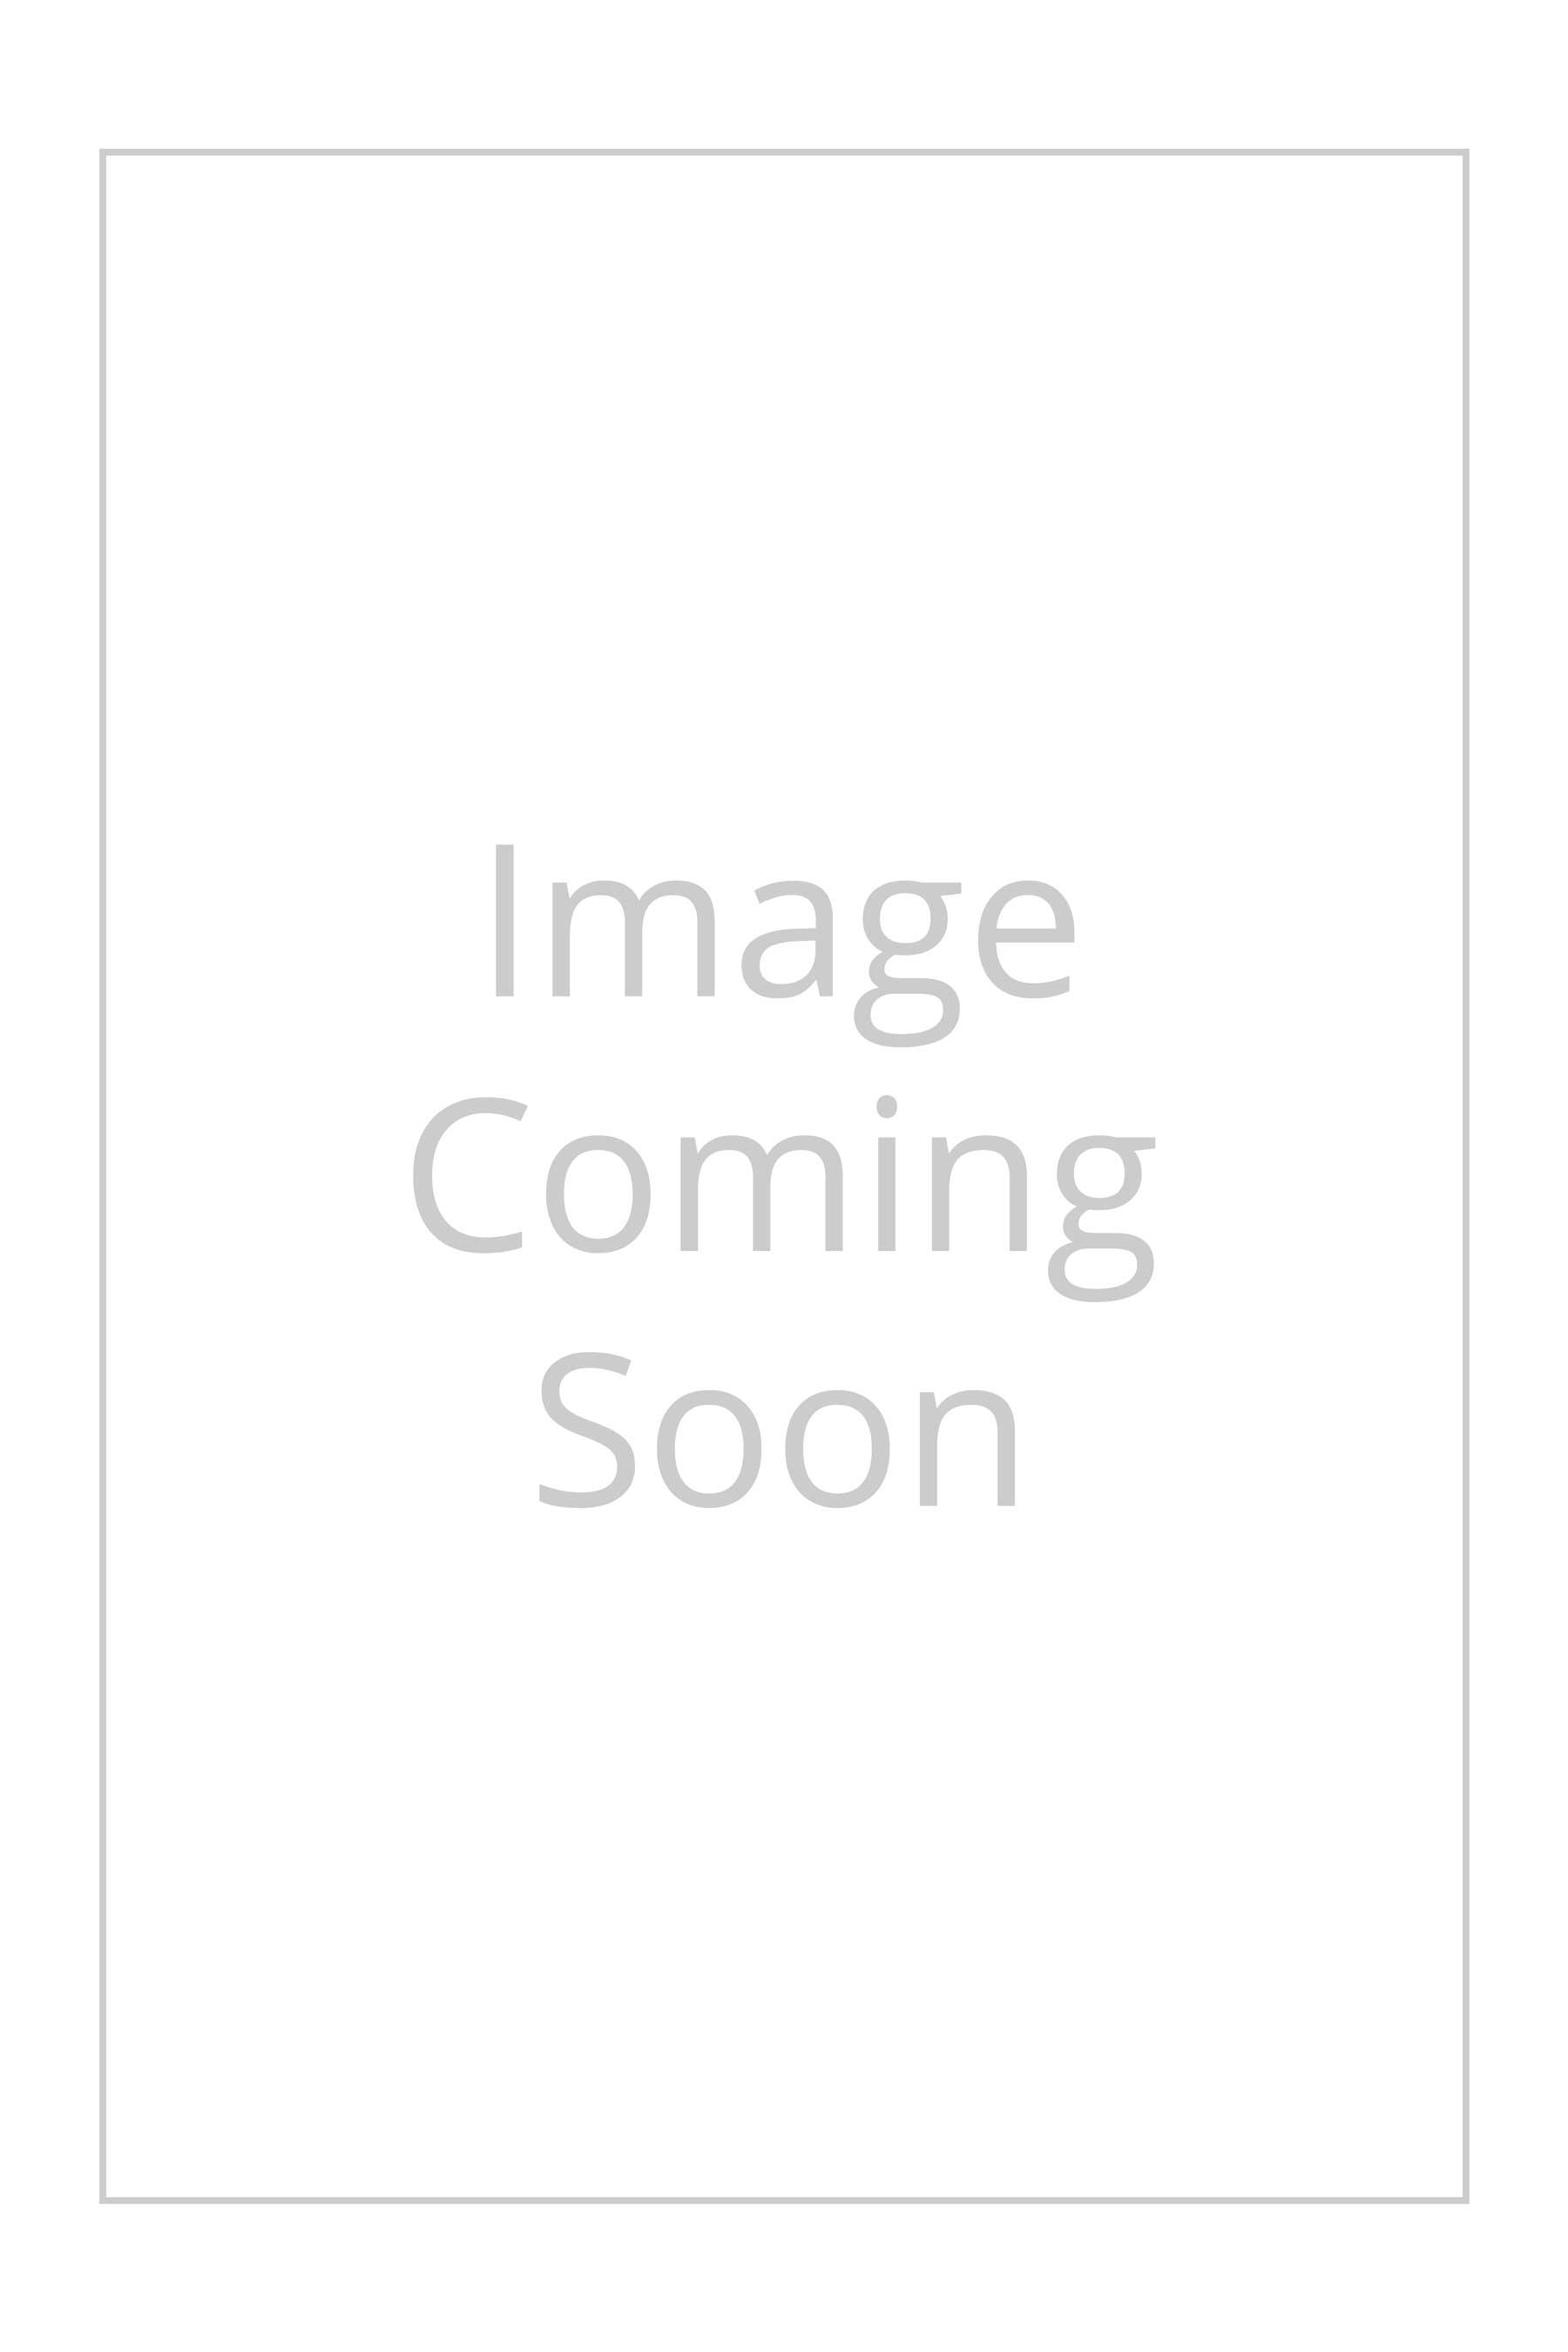 0dd87da3b1b Stuart Weitzman Black Patent Leather Ballet Flats with Bow sz 10 ...